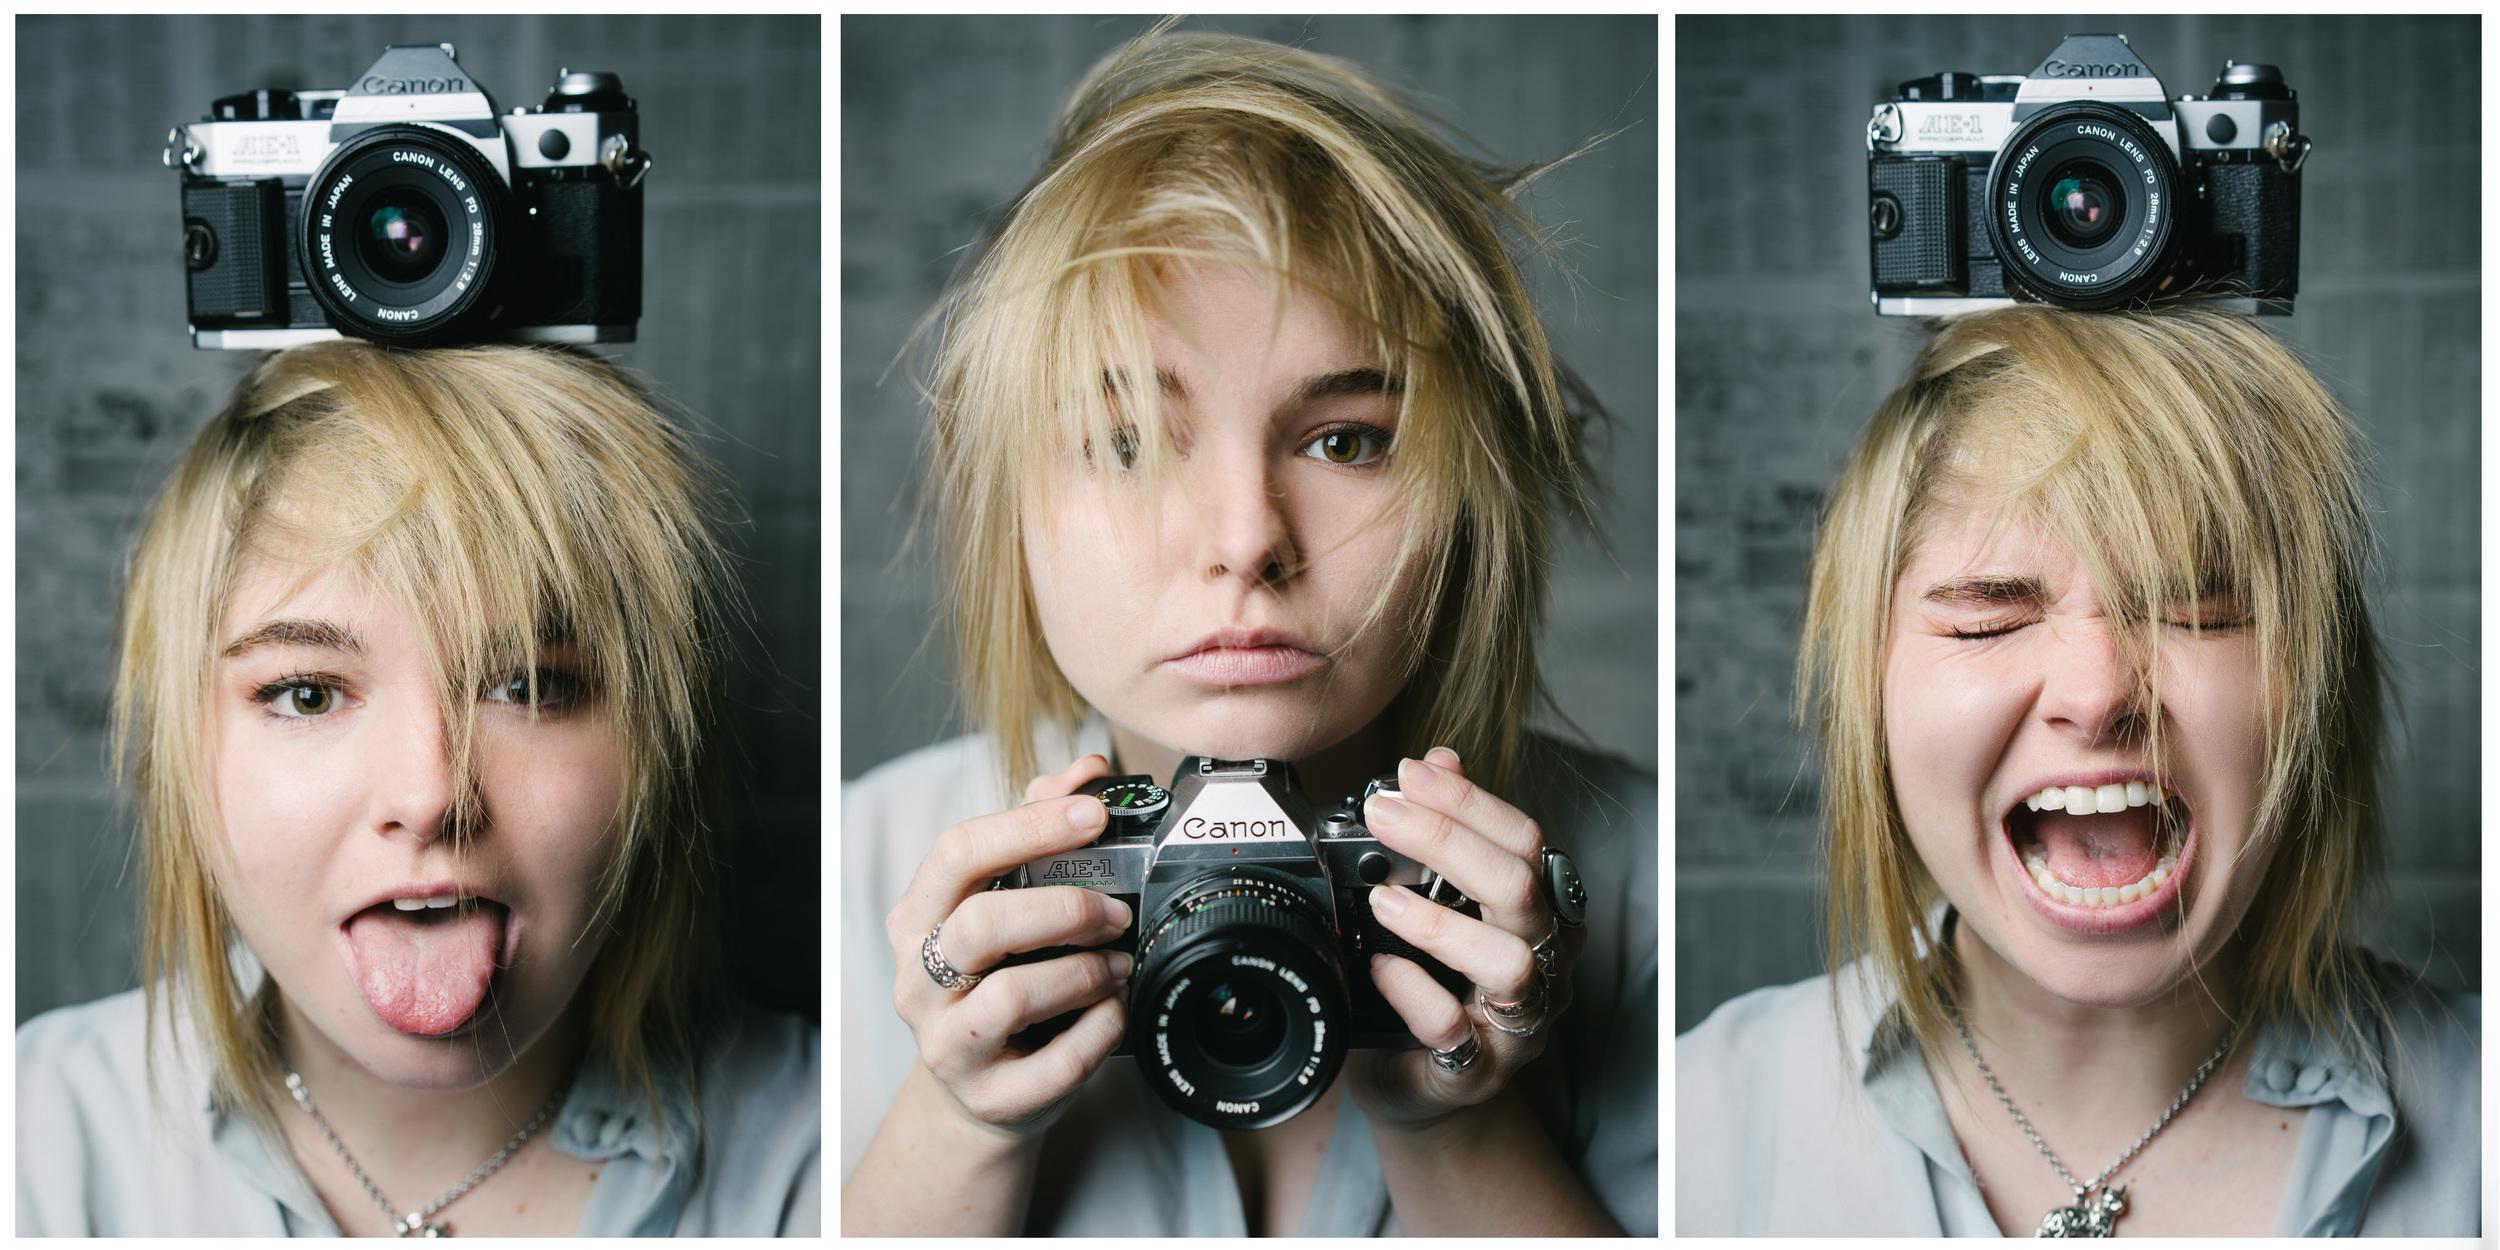 Model / Photographer:Macie Moon Pietrowicz (Macie Moon Photography)  Cameras used: Sony A7  Lens:Sonnar T* FE 55mm F1.8 Z